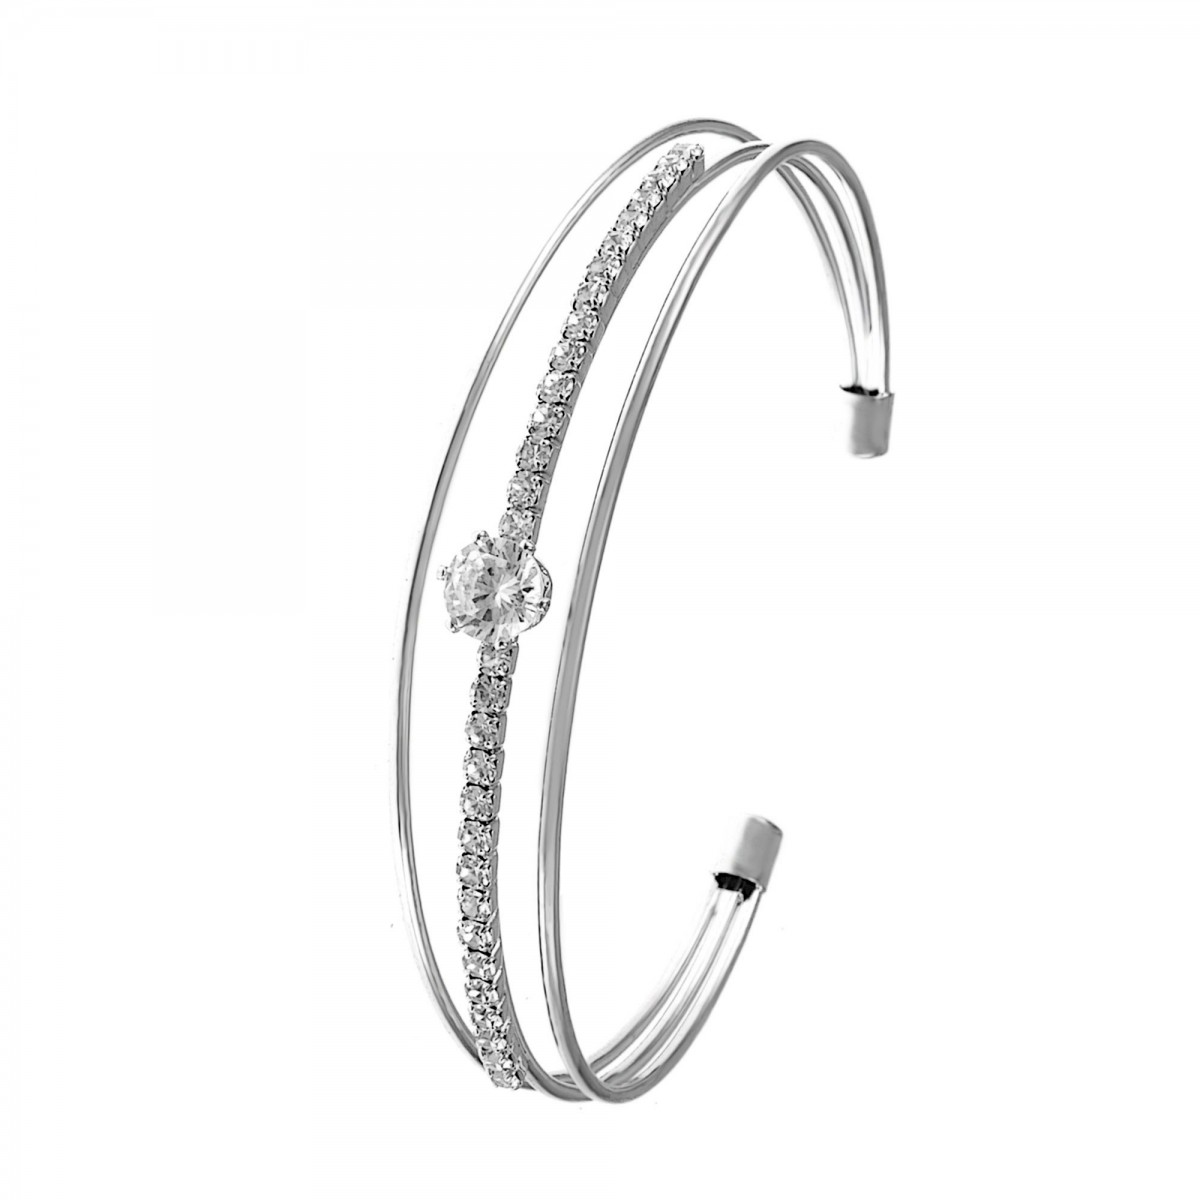 Bracelet mode So Charm made with crystal from Swarovski